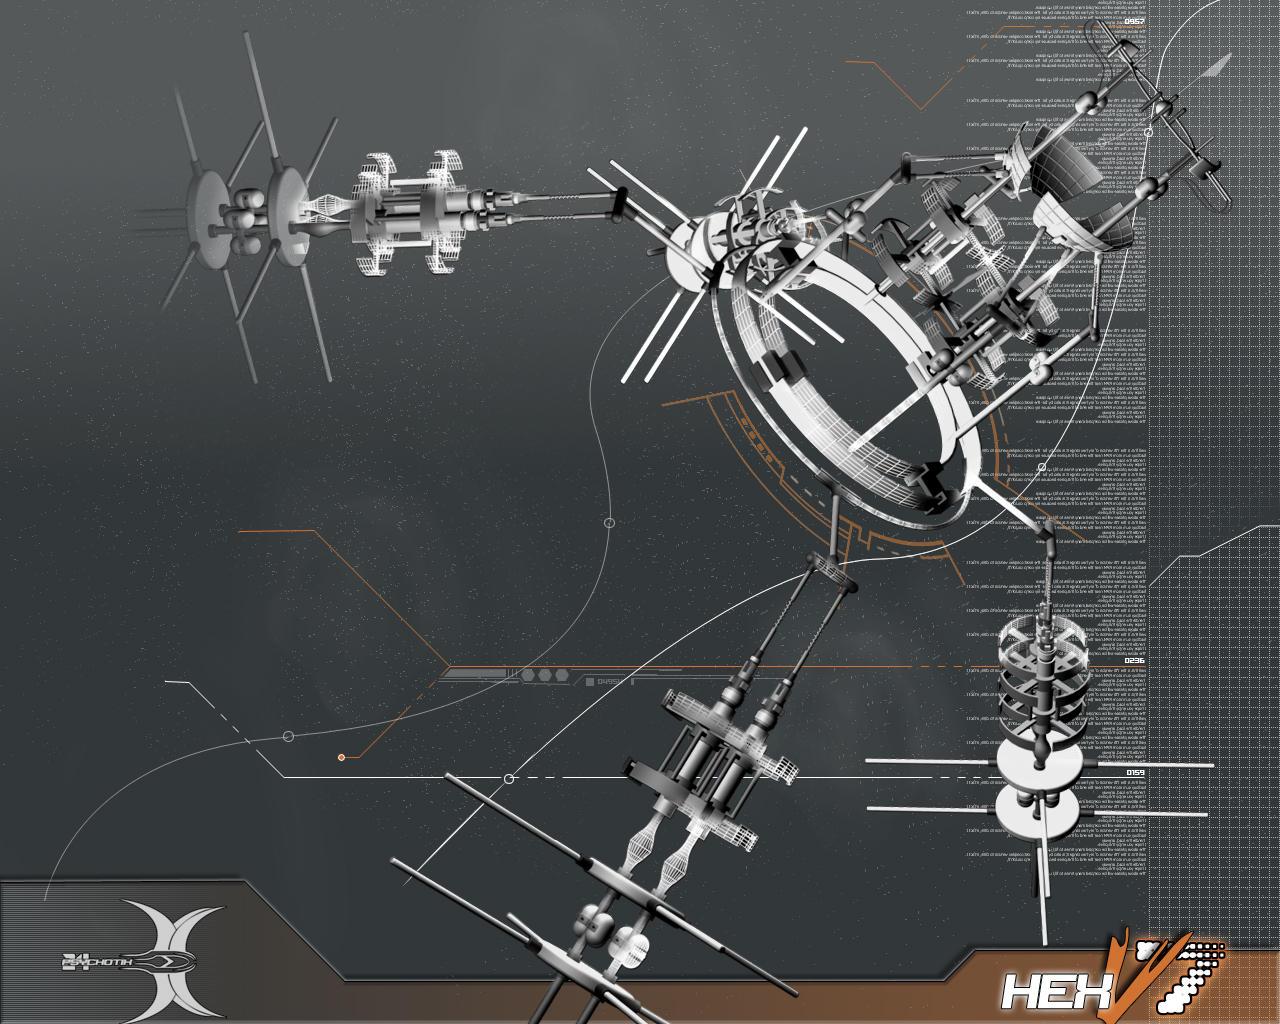 Hex version 7 by versyia